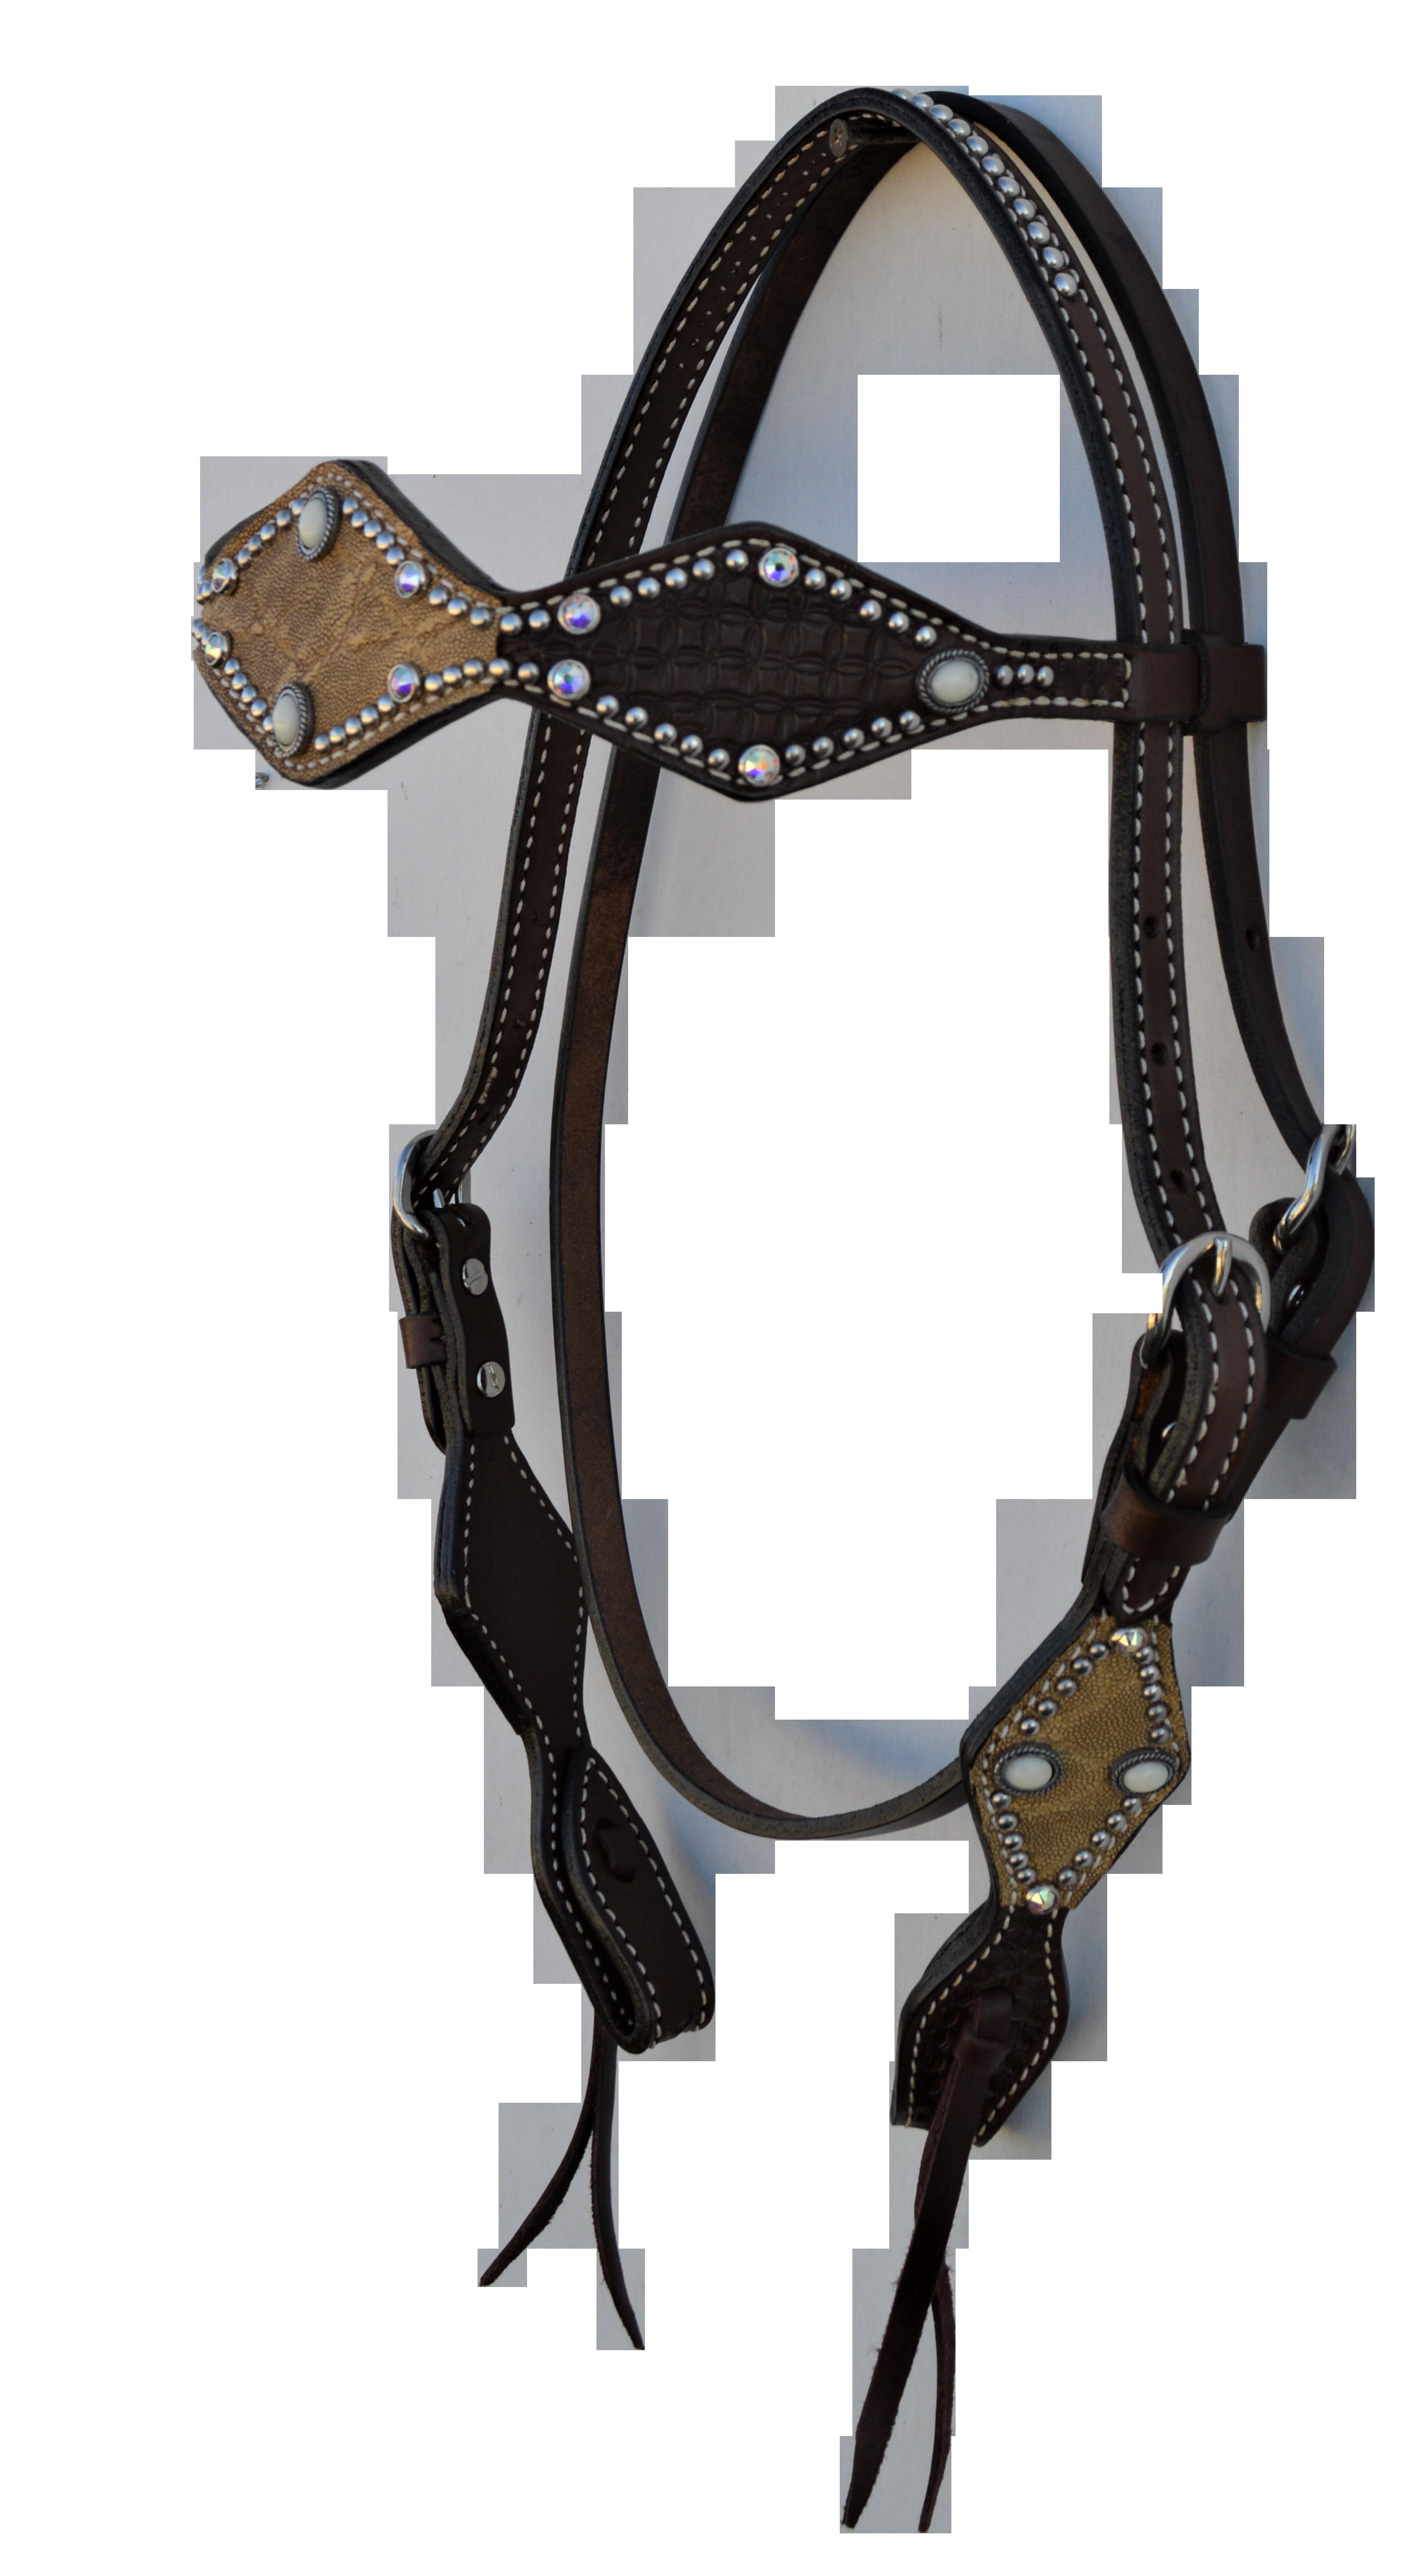 2046-TE 2-1/2 diamond headstall chocolate leather geo tooled taupe elephant overlay